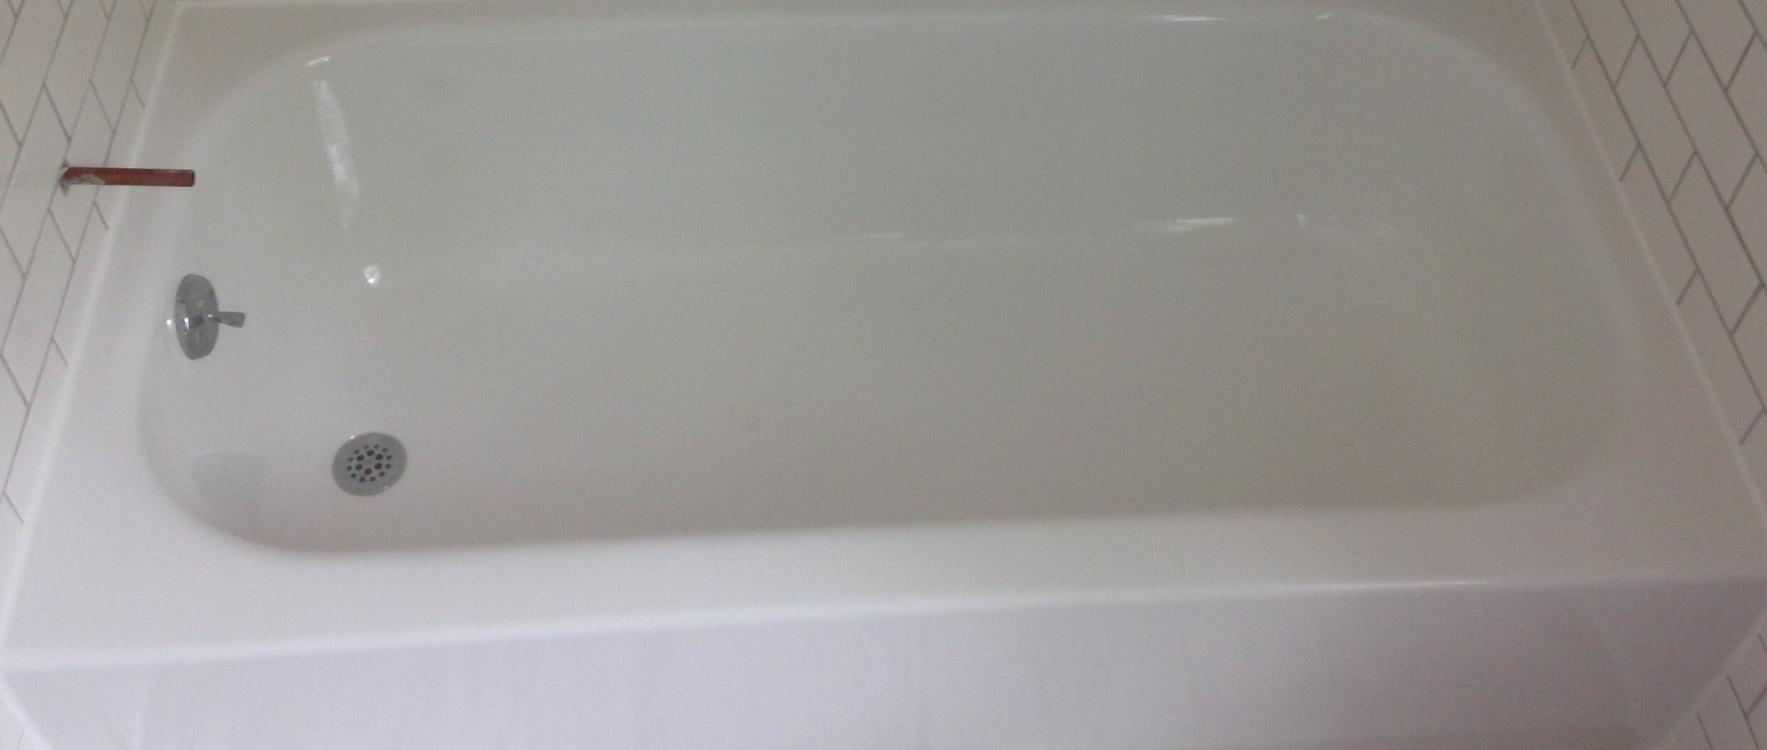 Bathtub & Shower Resurfacing